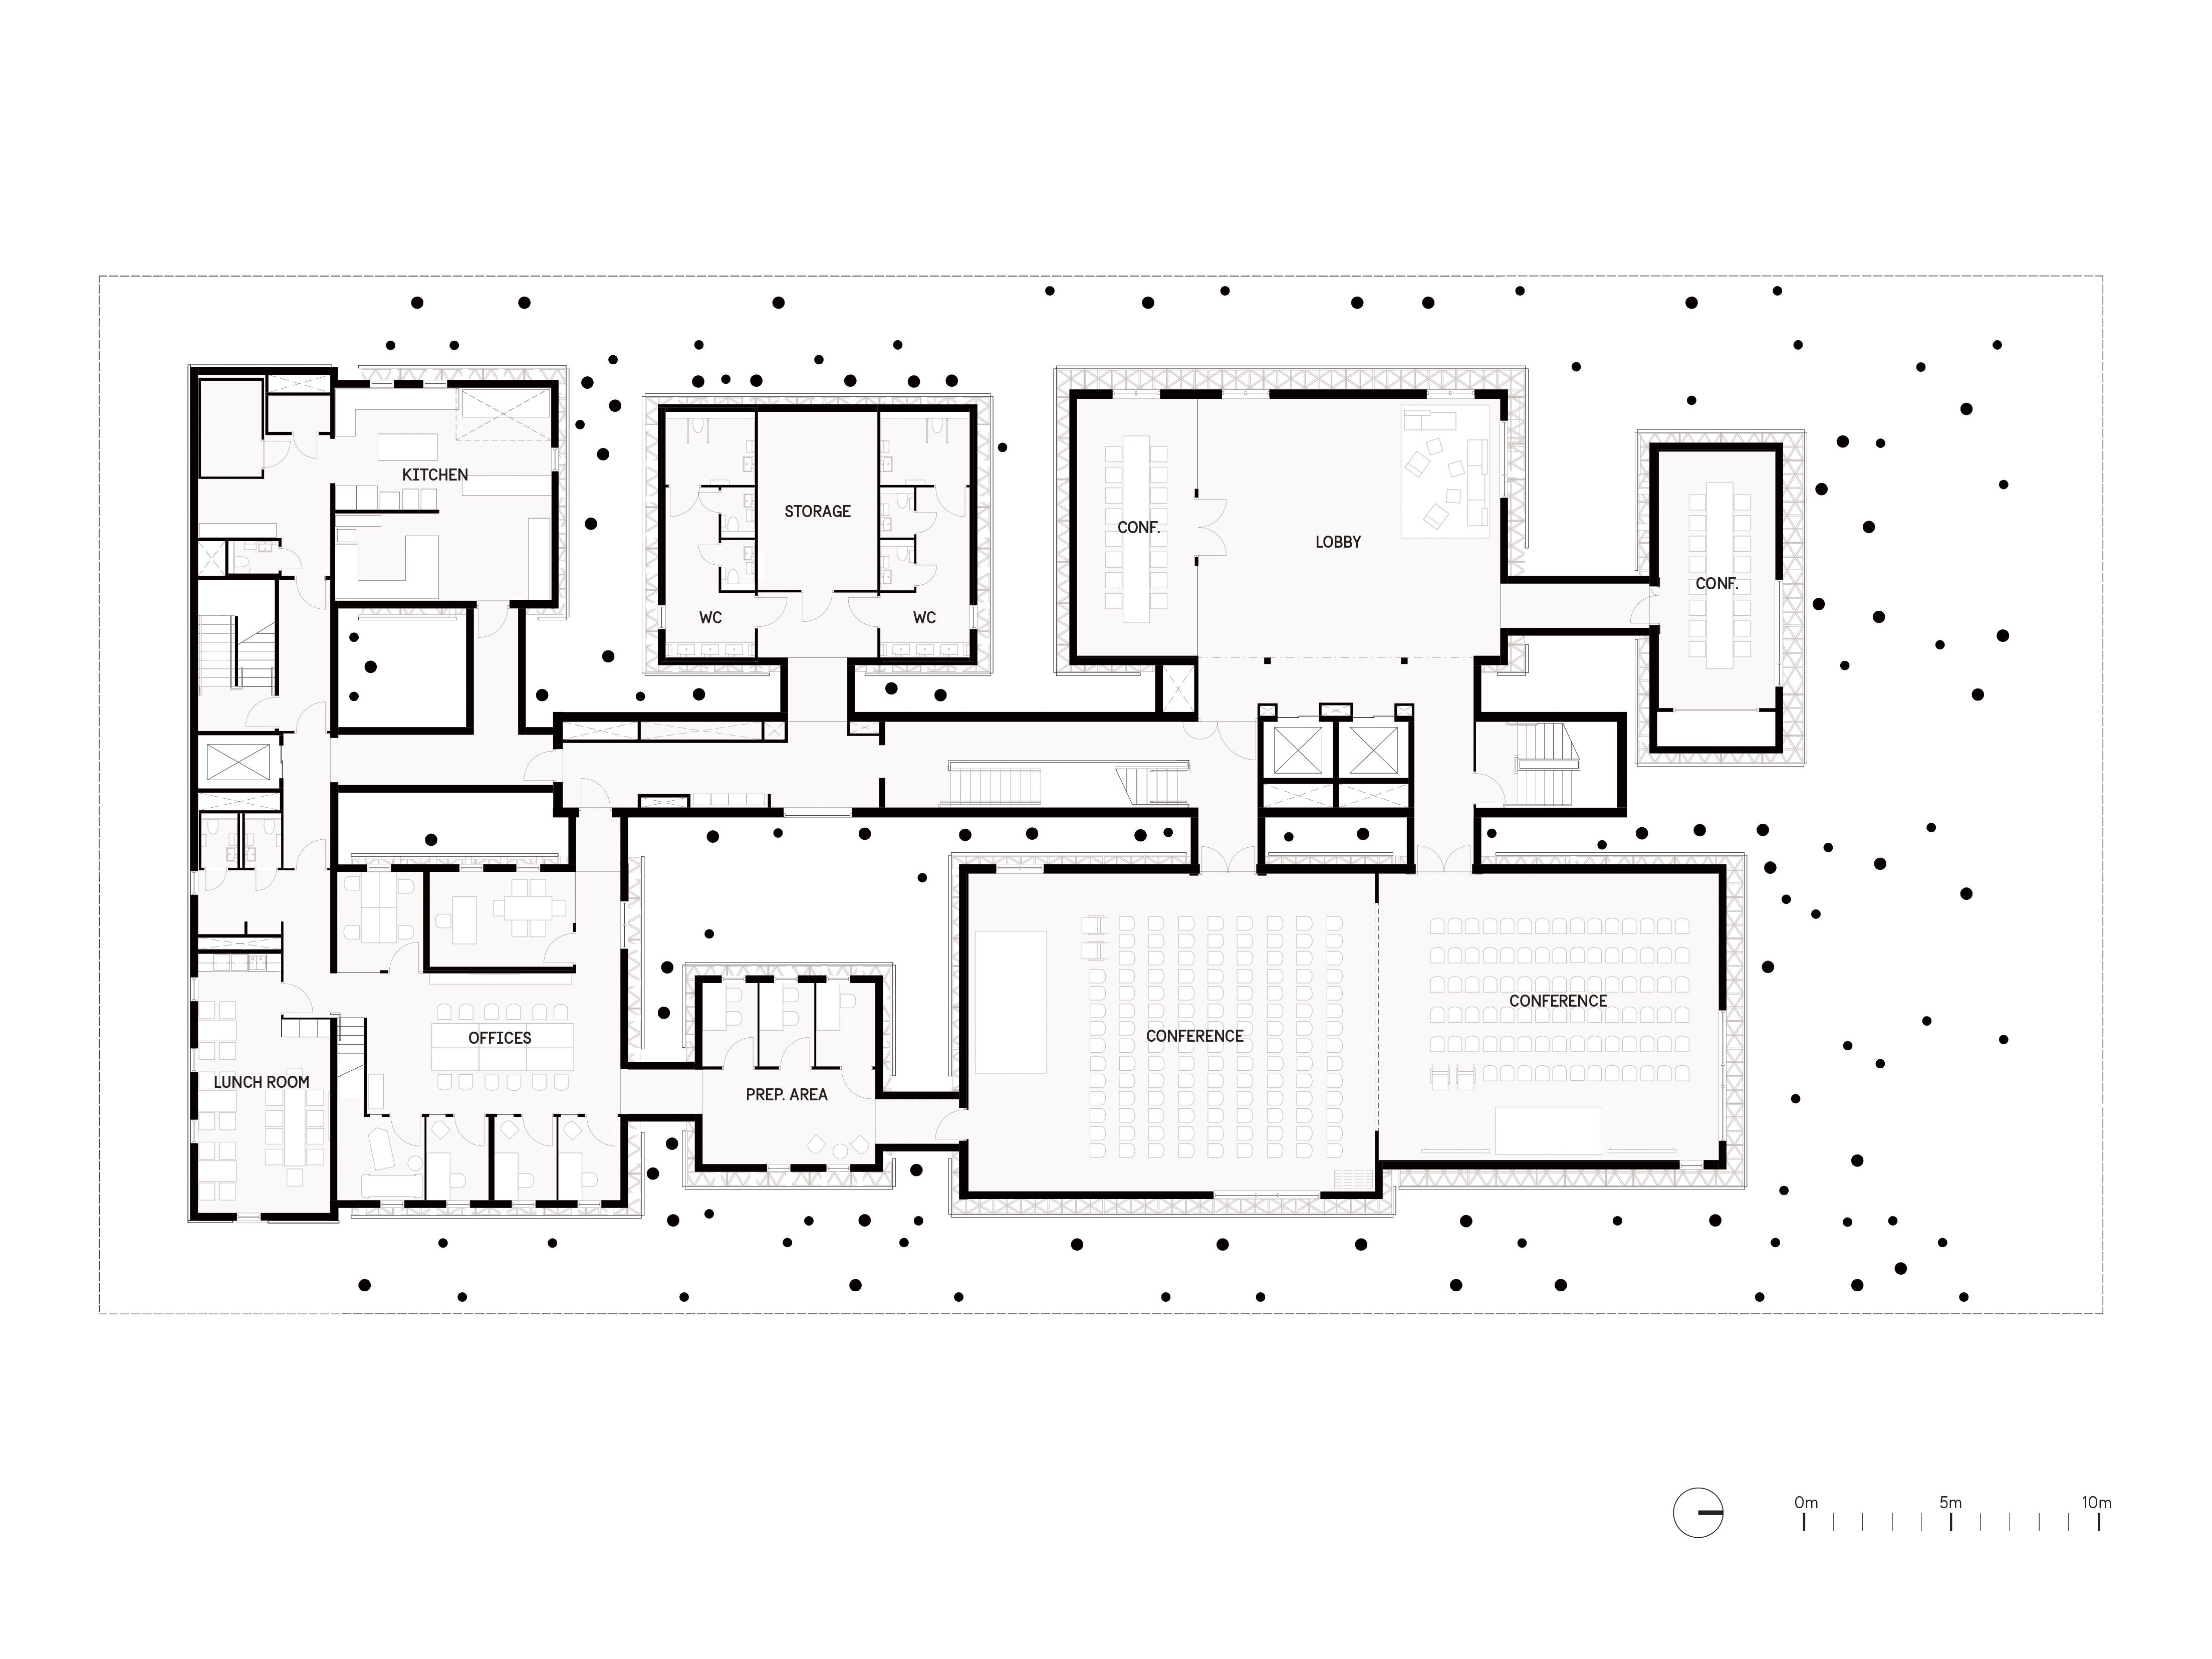 Alessandro-Ripellino-Arkitekter_Studio-Adrien-Gardere_Luigi-Pardo-Architetti_the-forest_conference plan